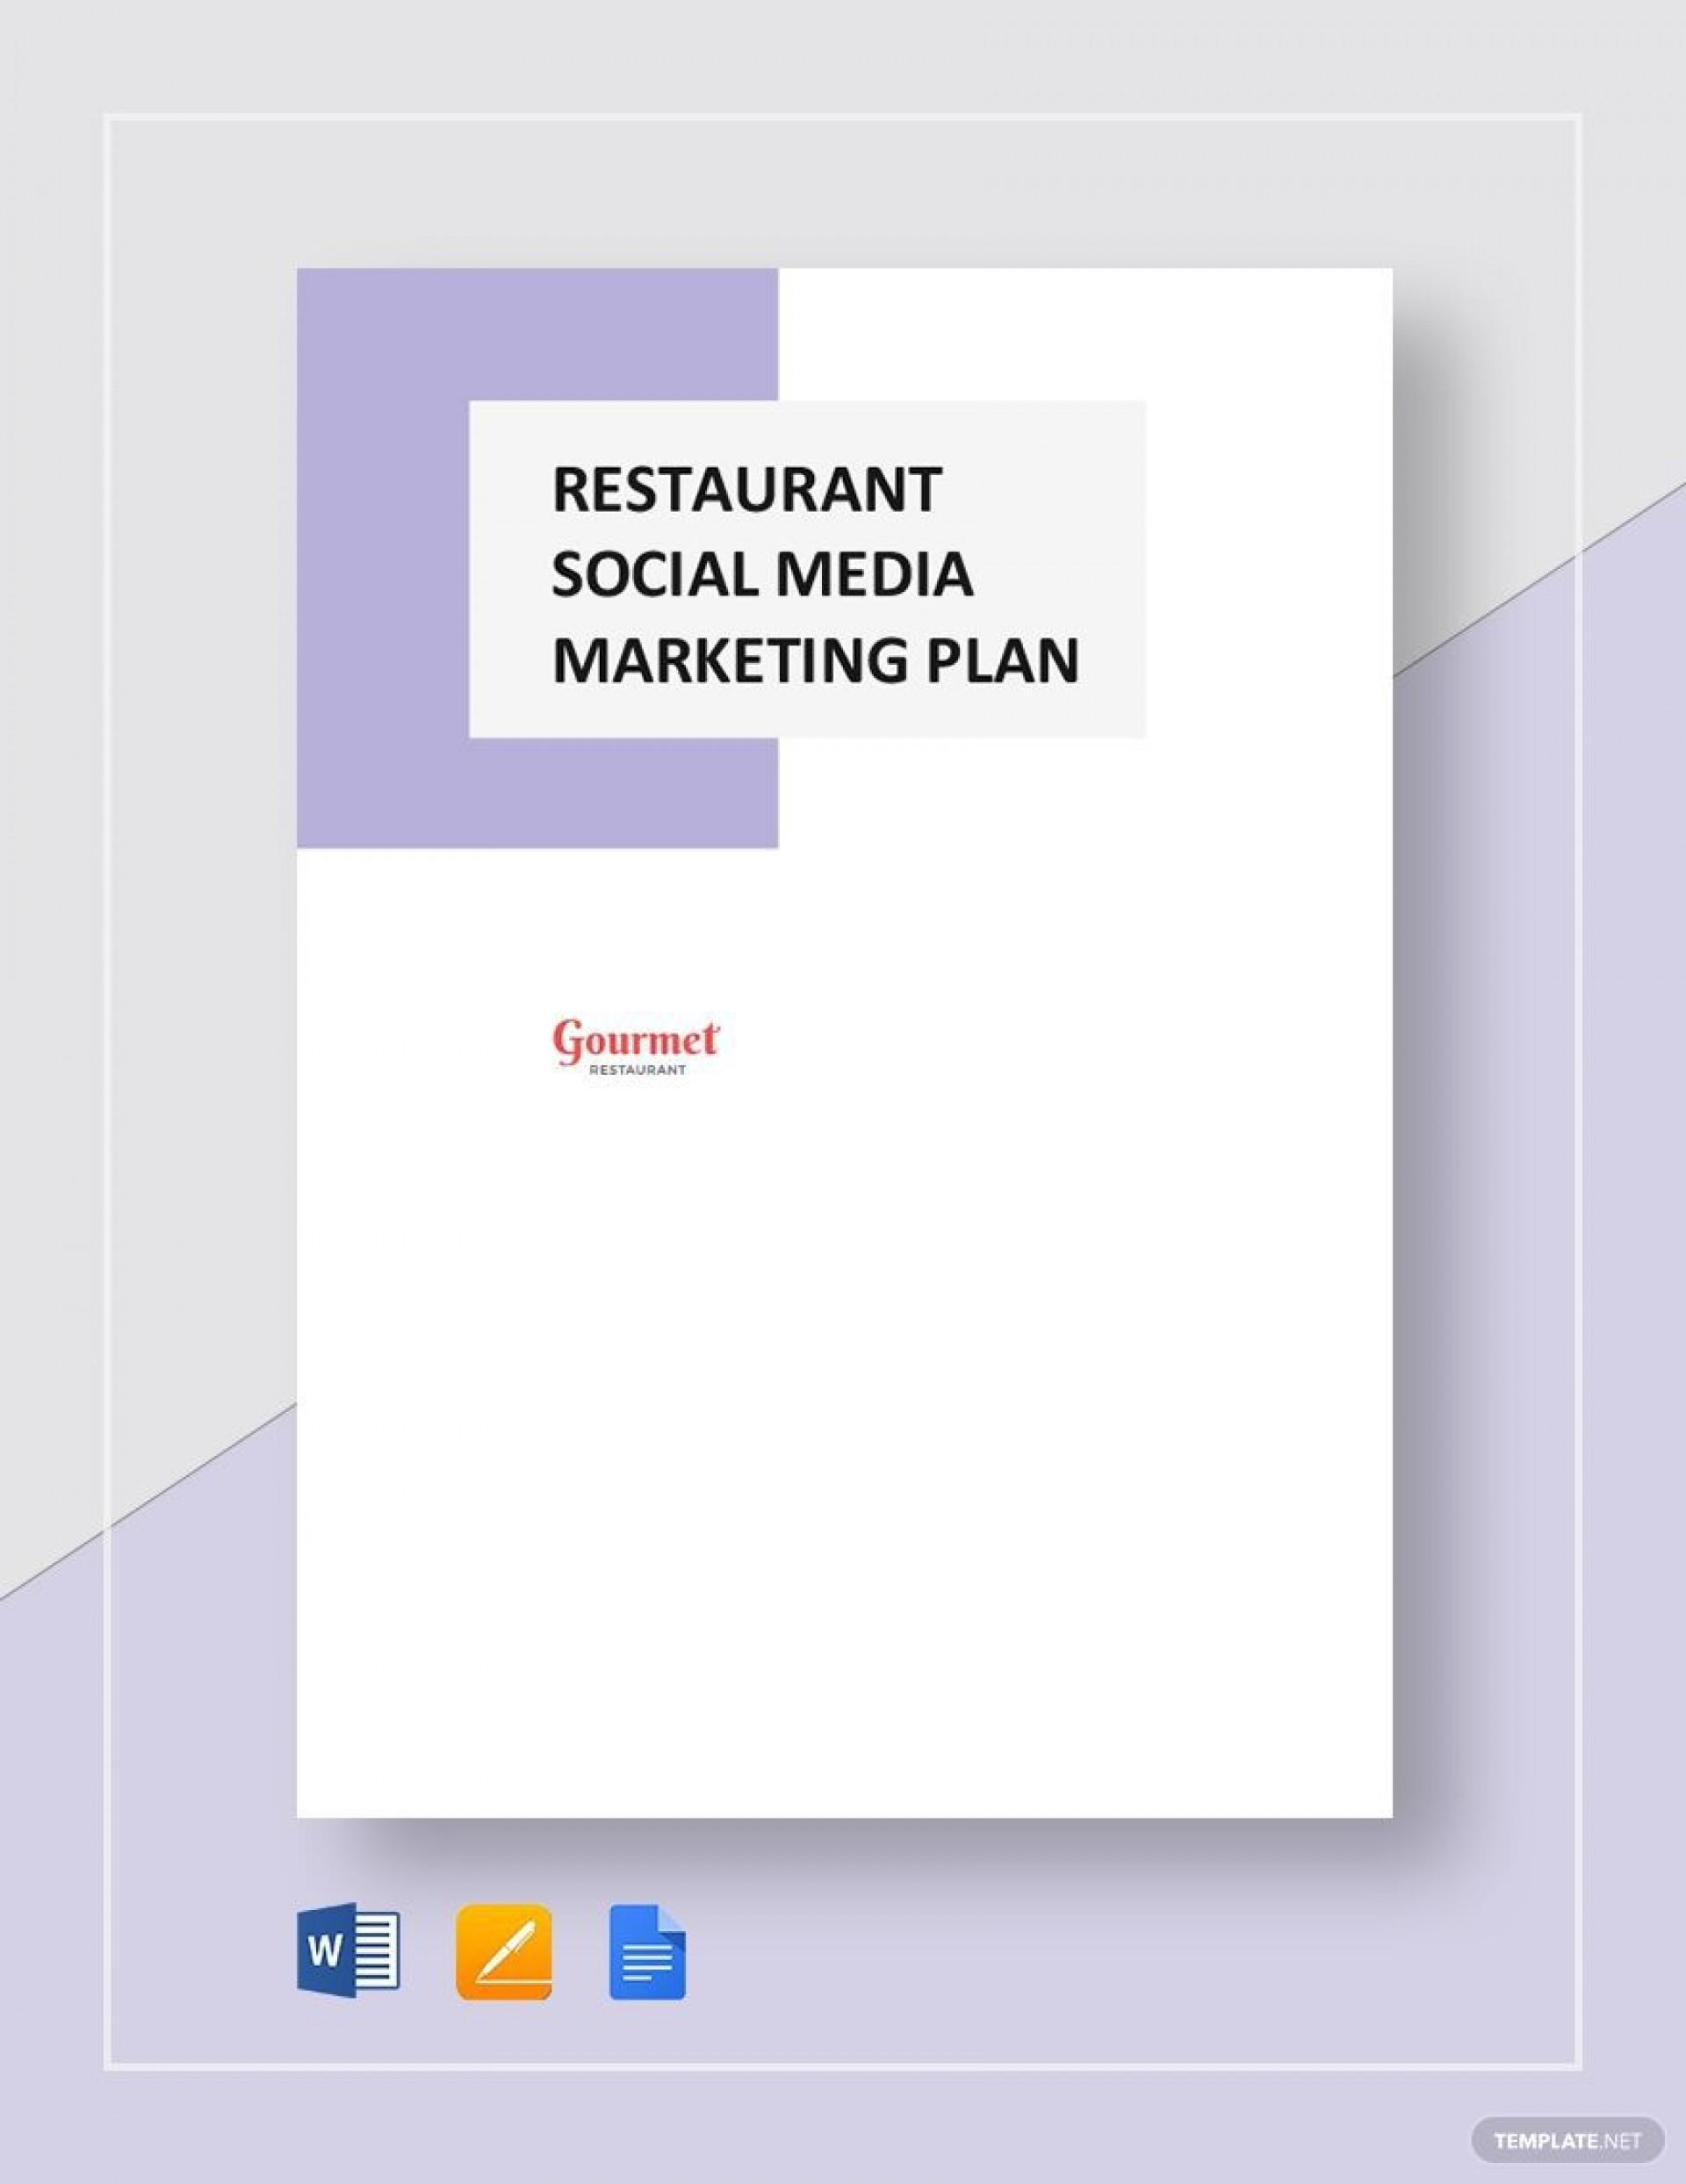 004 Impressive Social Media Marketing Plan Template Doc Highest Clarity 1920